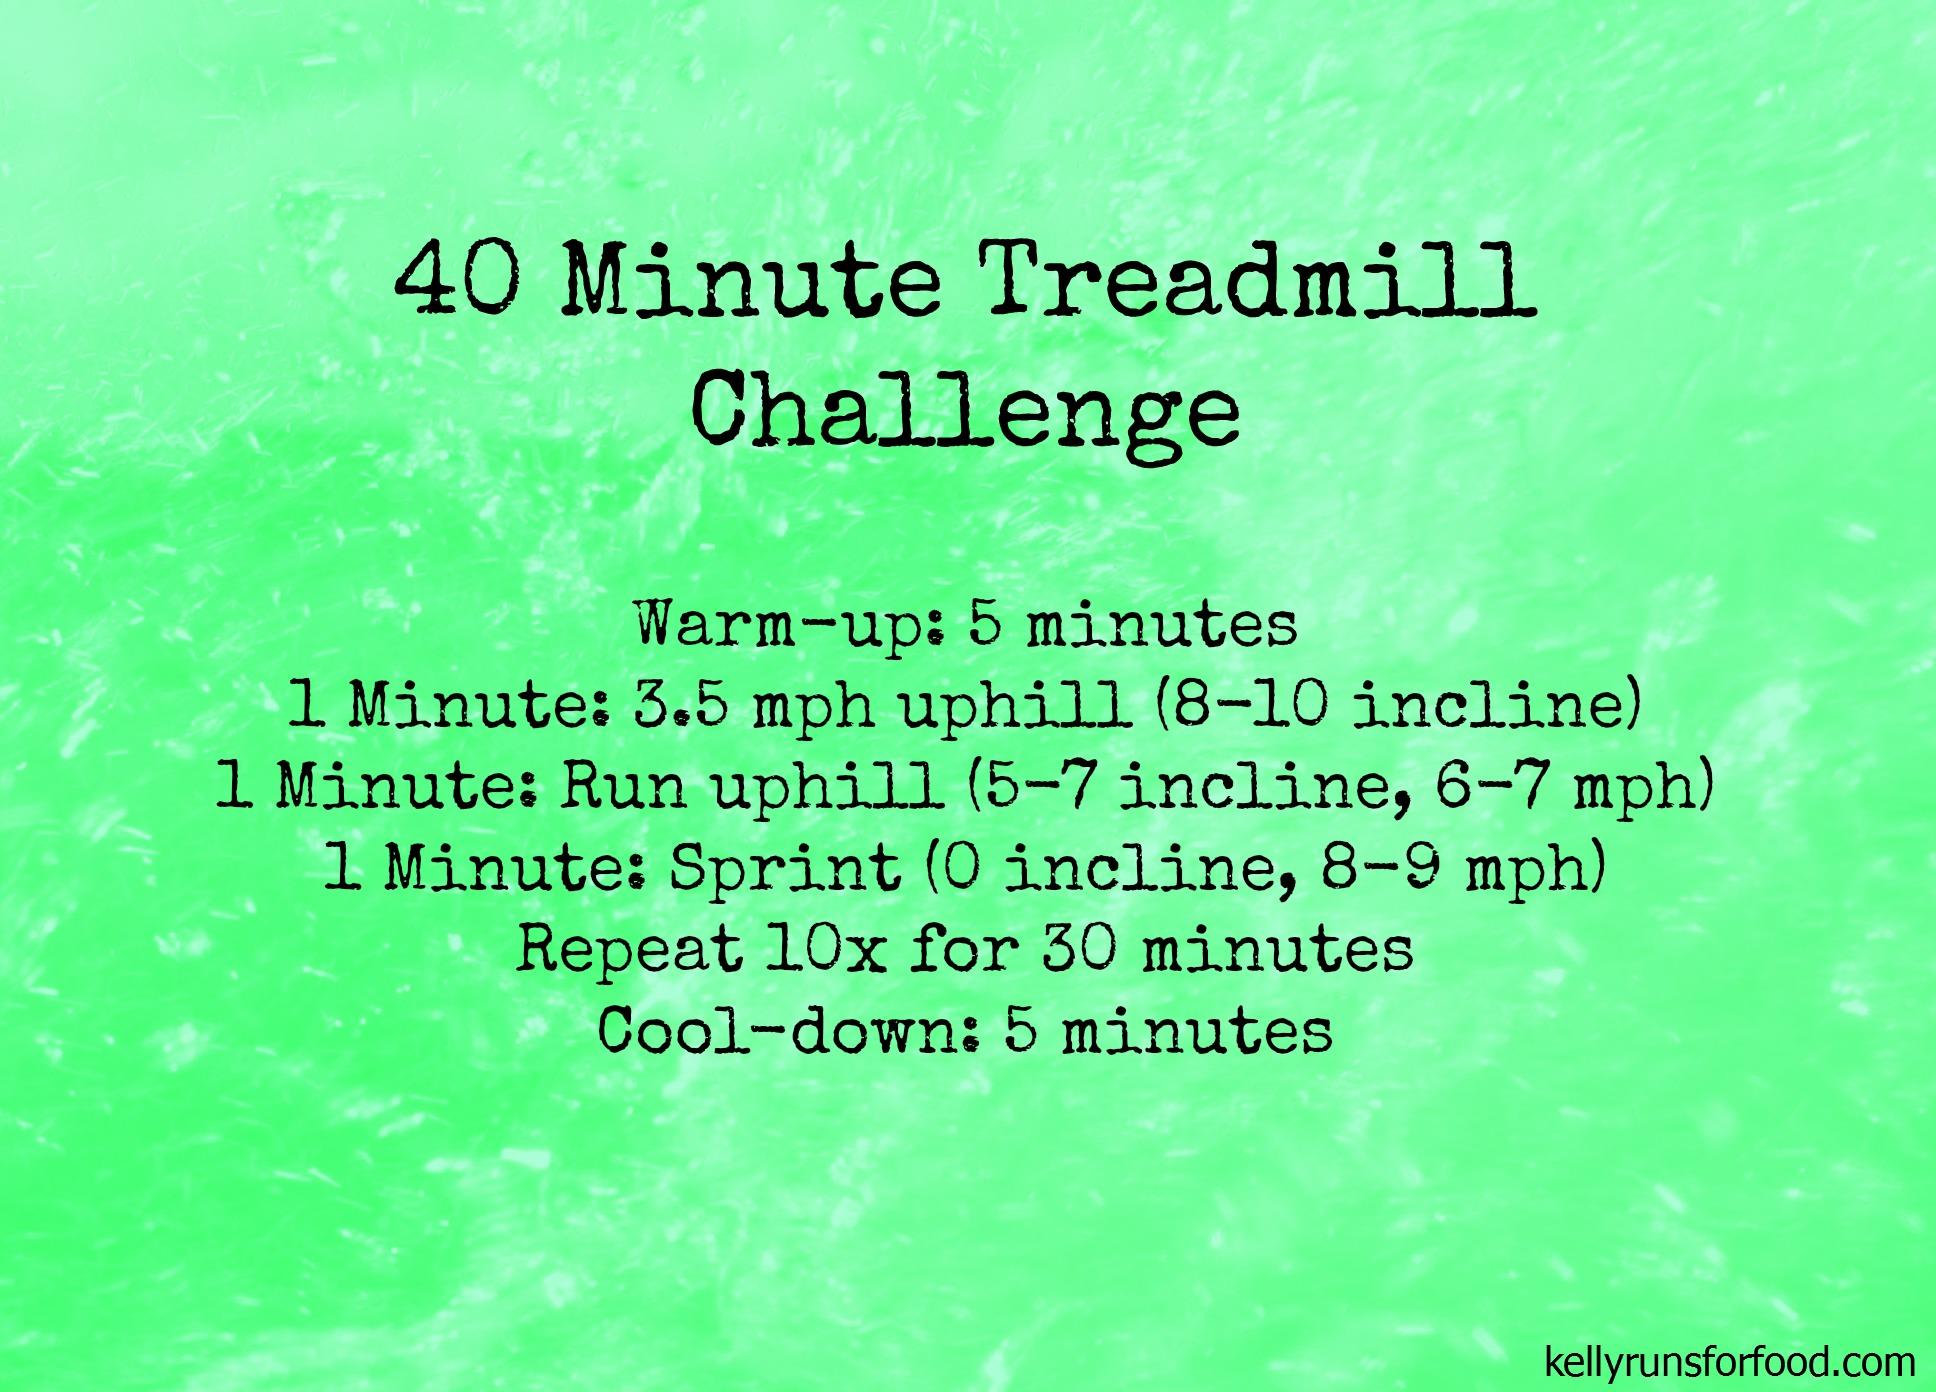 40 minute treadmill challenge